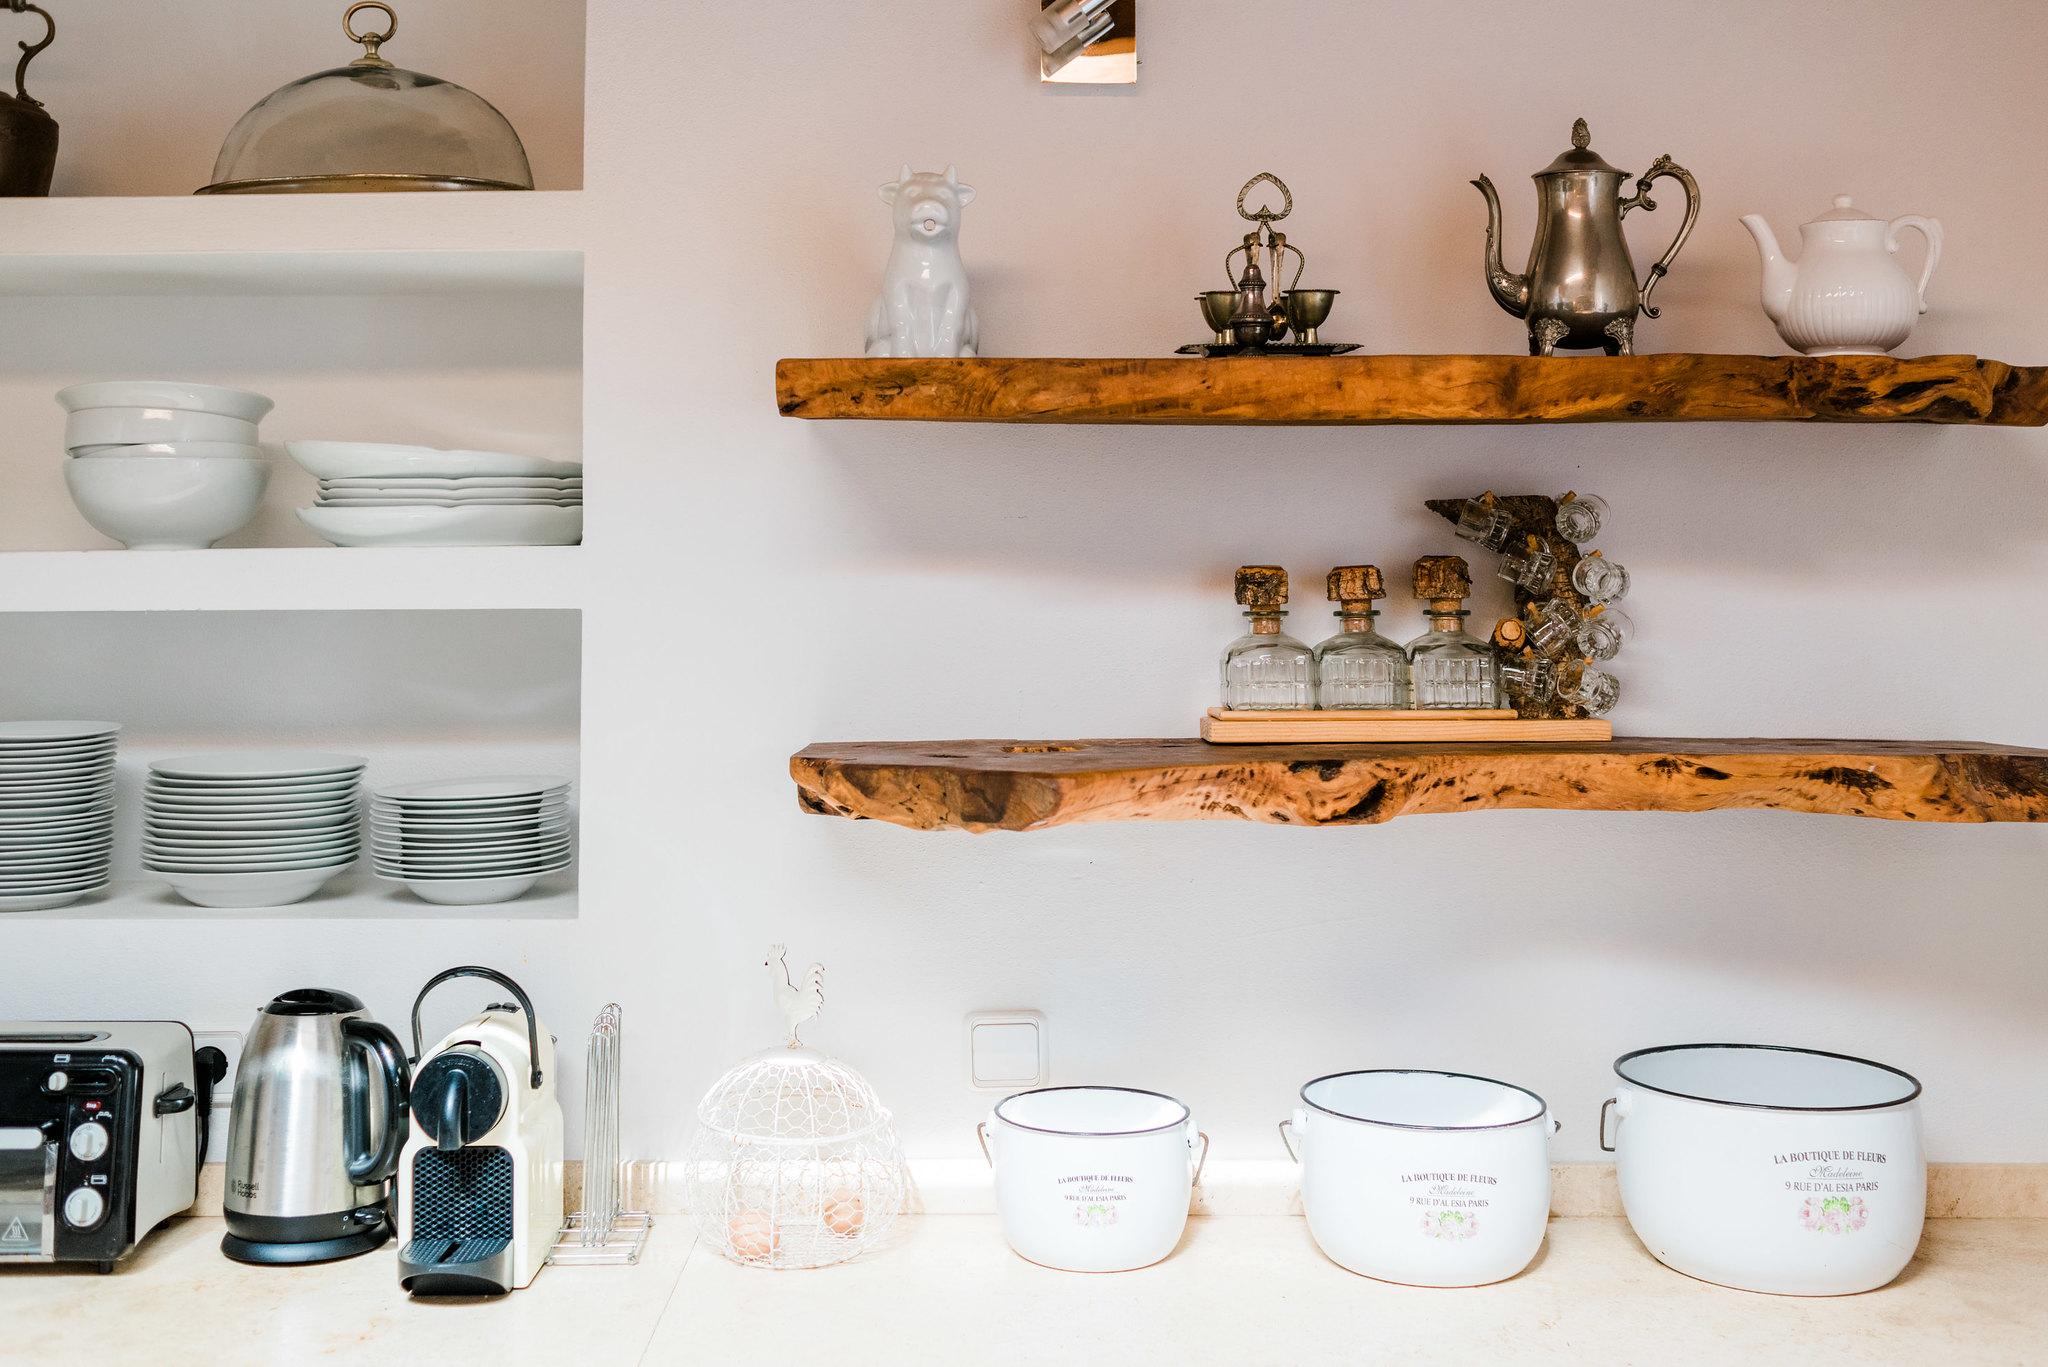 https://www.white-ibiza.com/wp-content/uploads/2020/06/white-ibiza-villas-los-corrales-interior-kitchen-detail.jpg